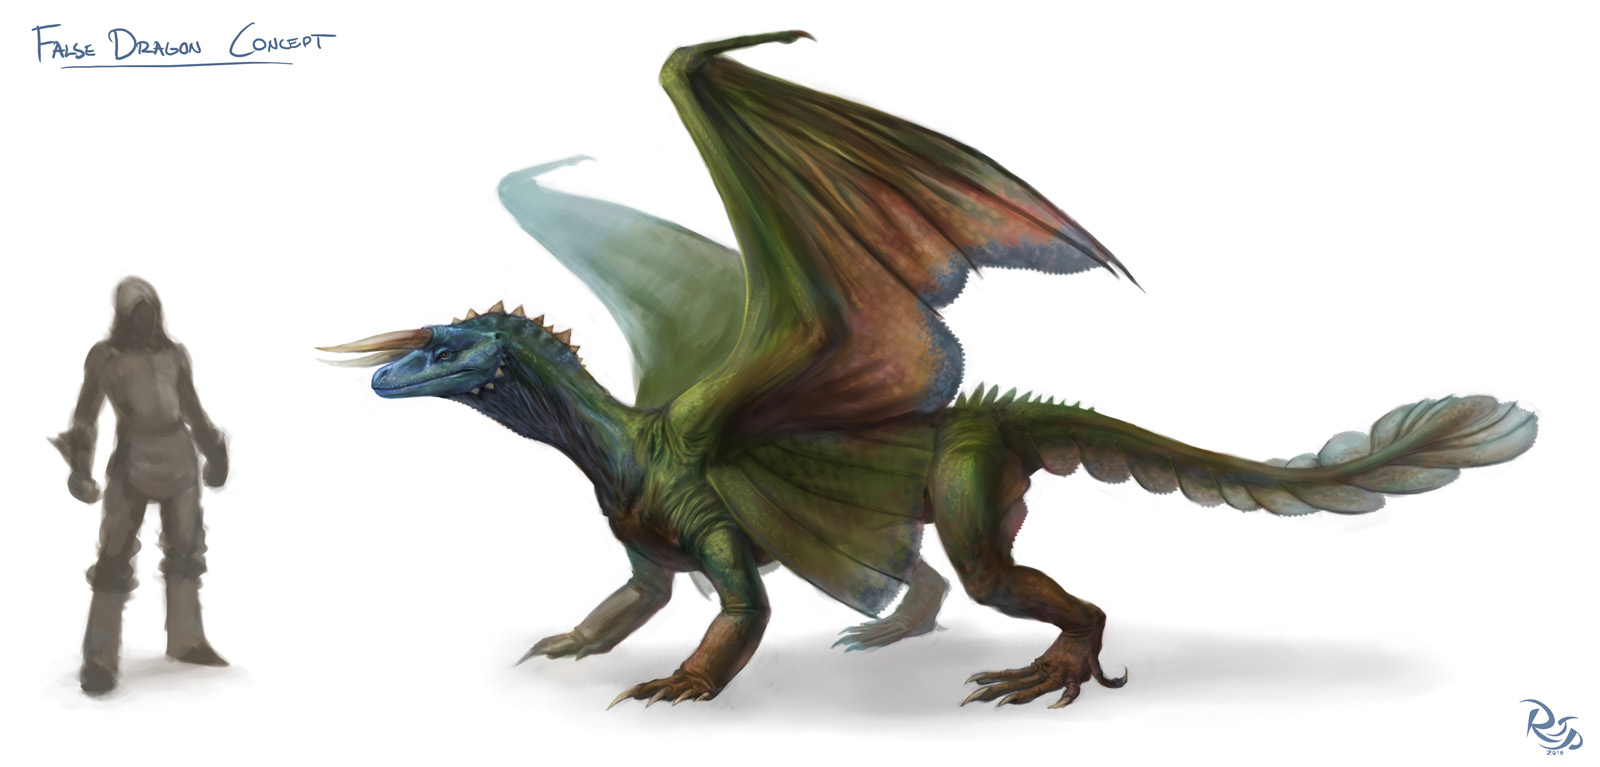 False Dragon Concept